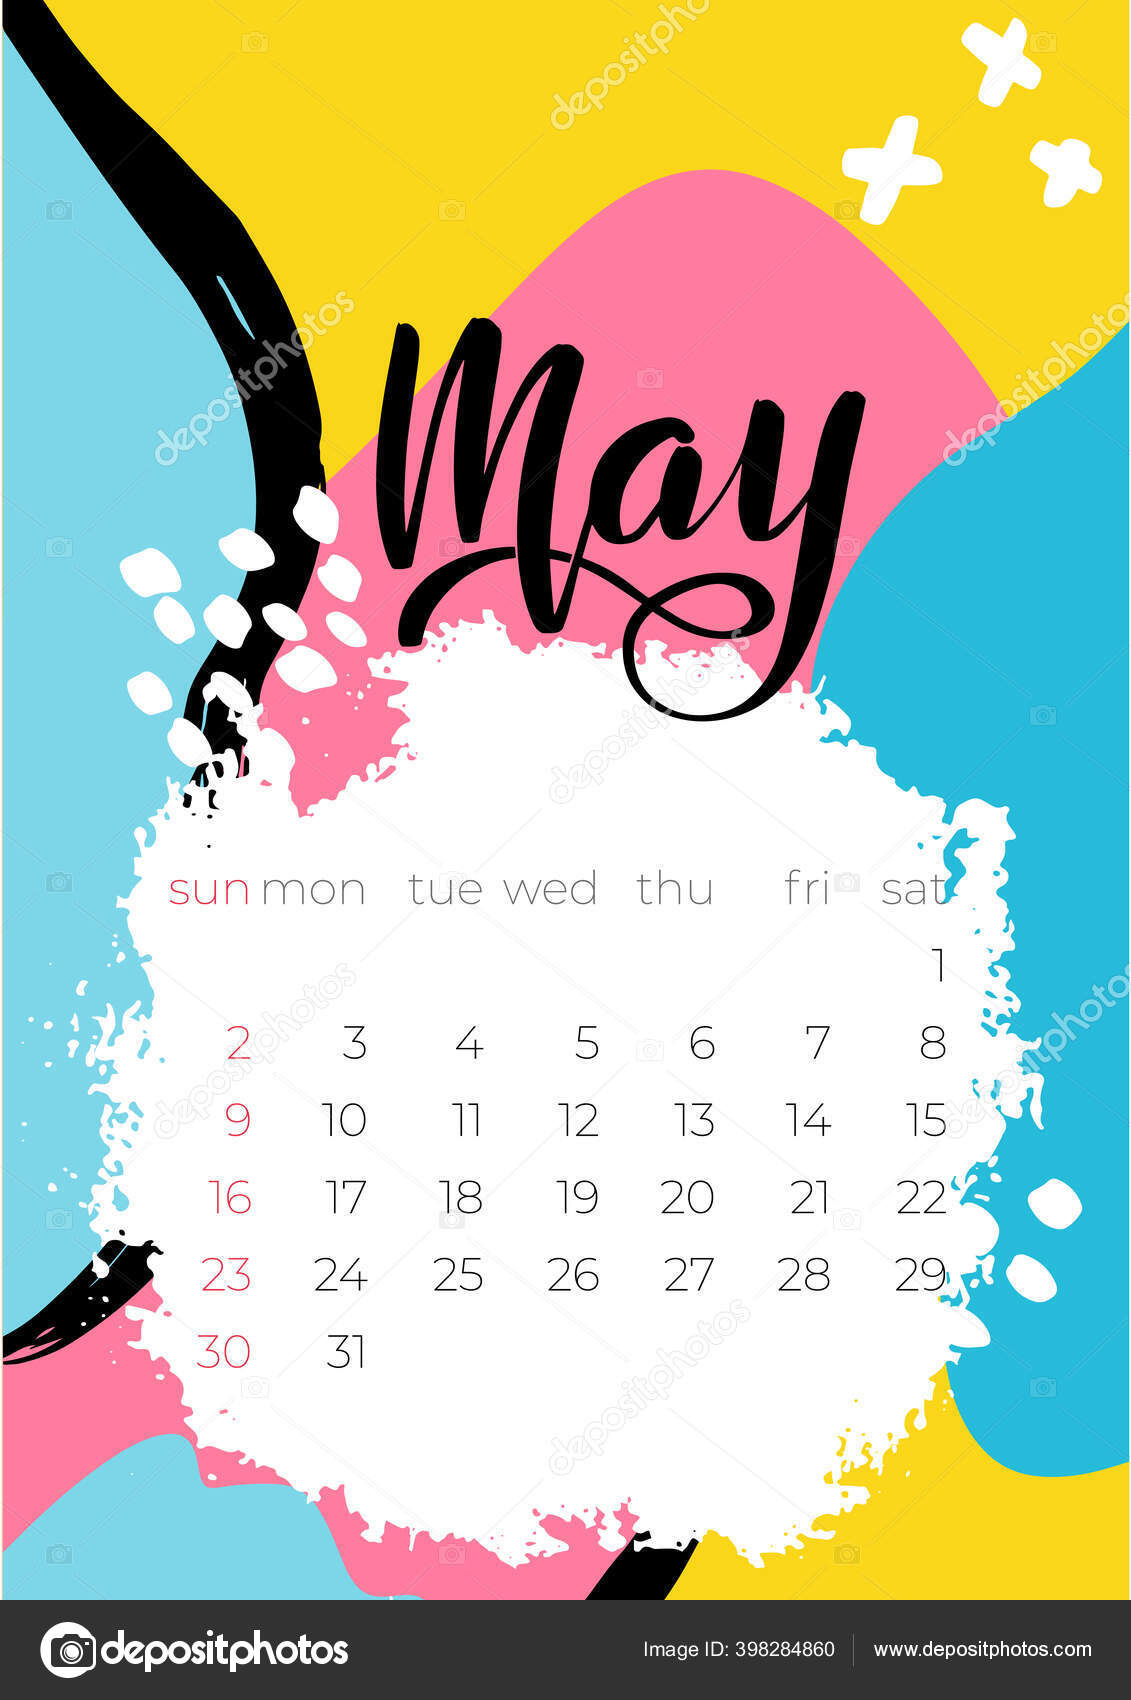 2021 Depo Schedule